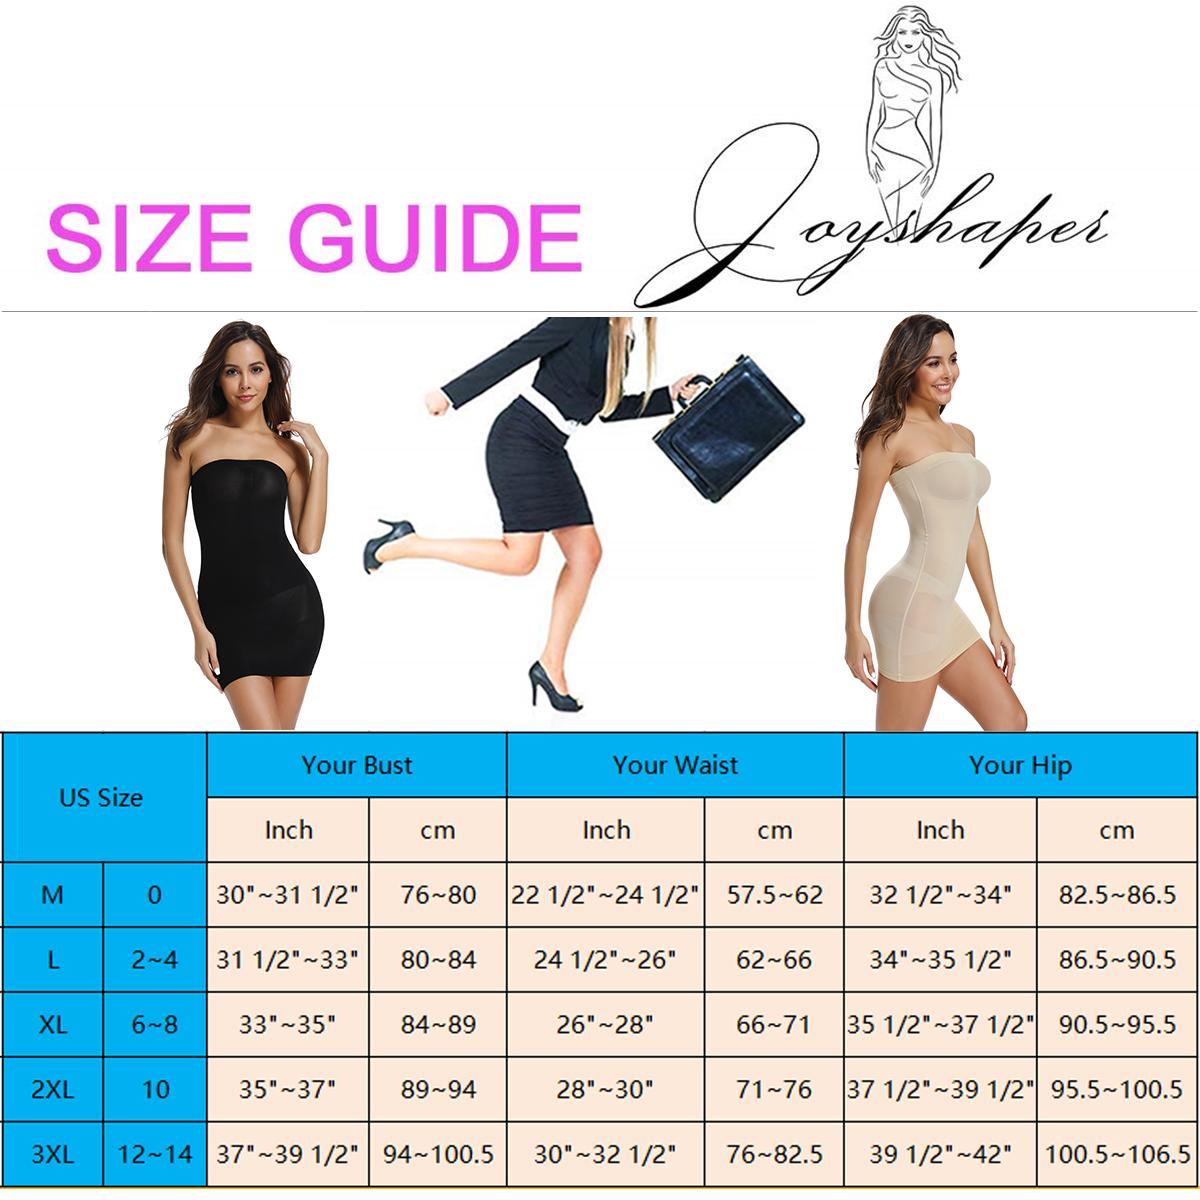 Joyshaper New Strapless Off Shoulder Top Dress Slip Body Shapers Mulheres Sexy Tummy Control Butt Lift Hip Skirt Shapewear sem costura